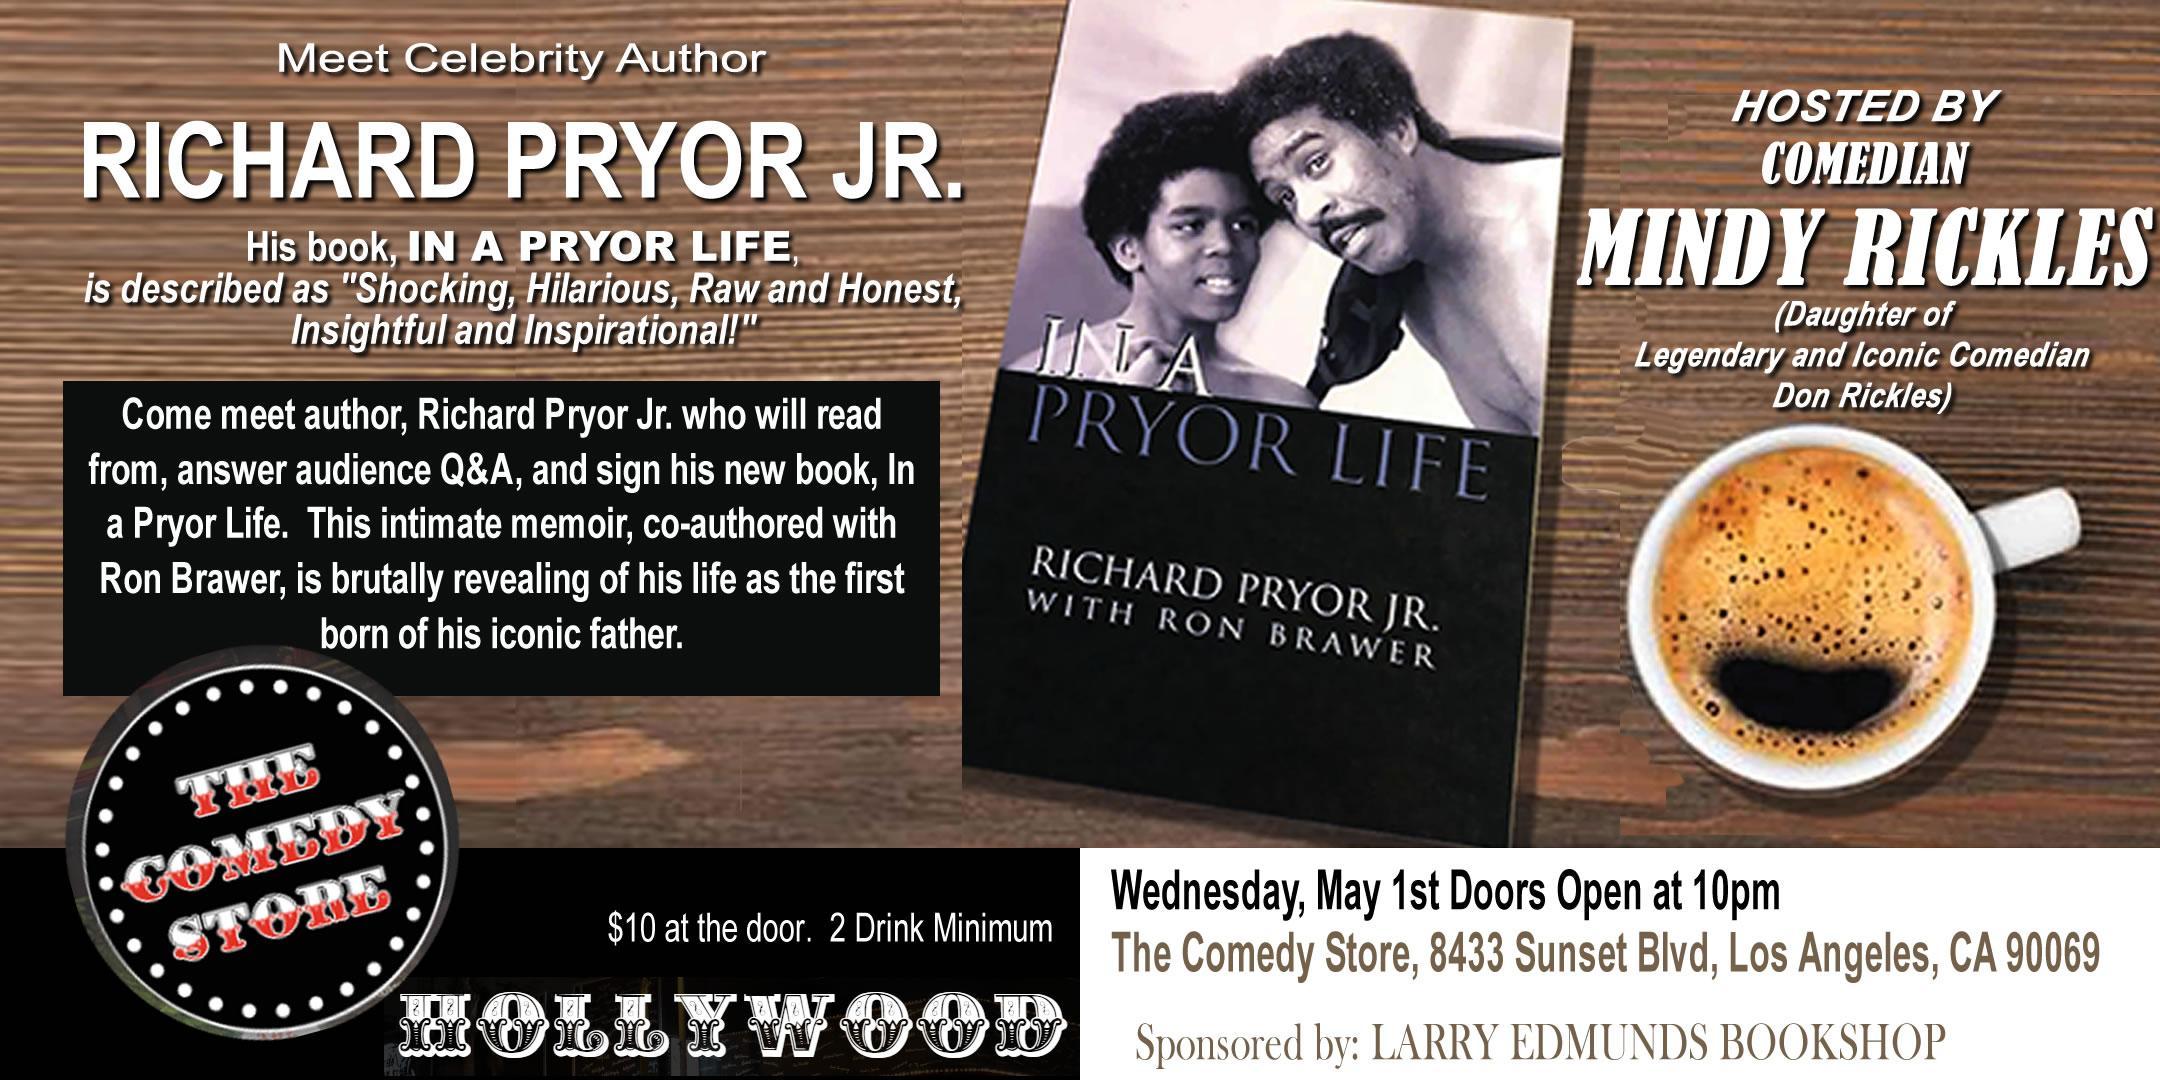 In a Pryor Life with Richard Pryor Jr.